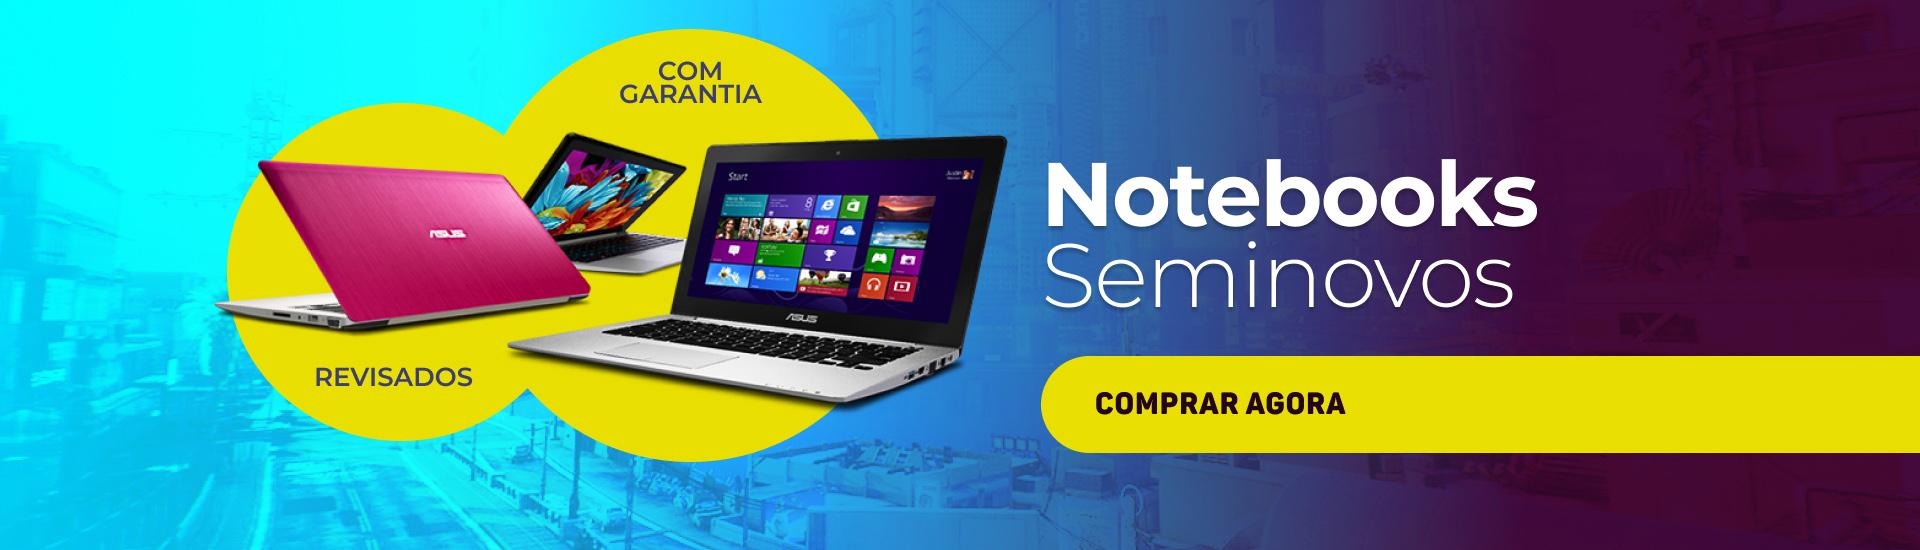 Notebooks Seminovos